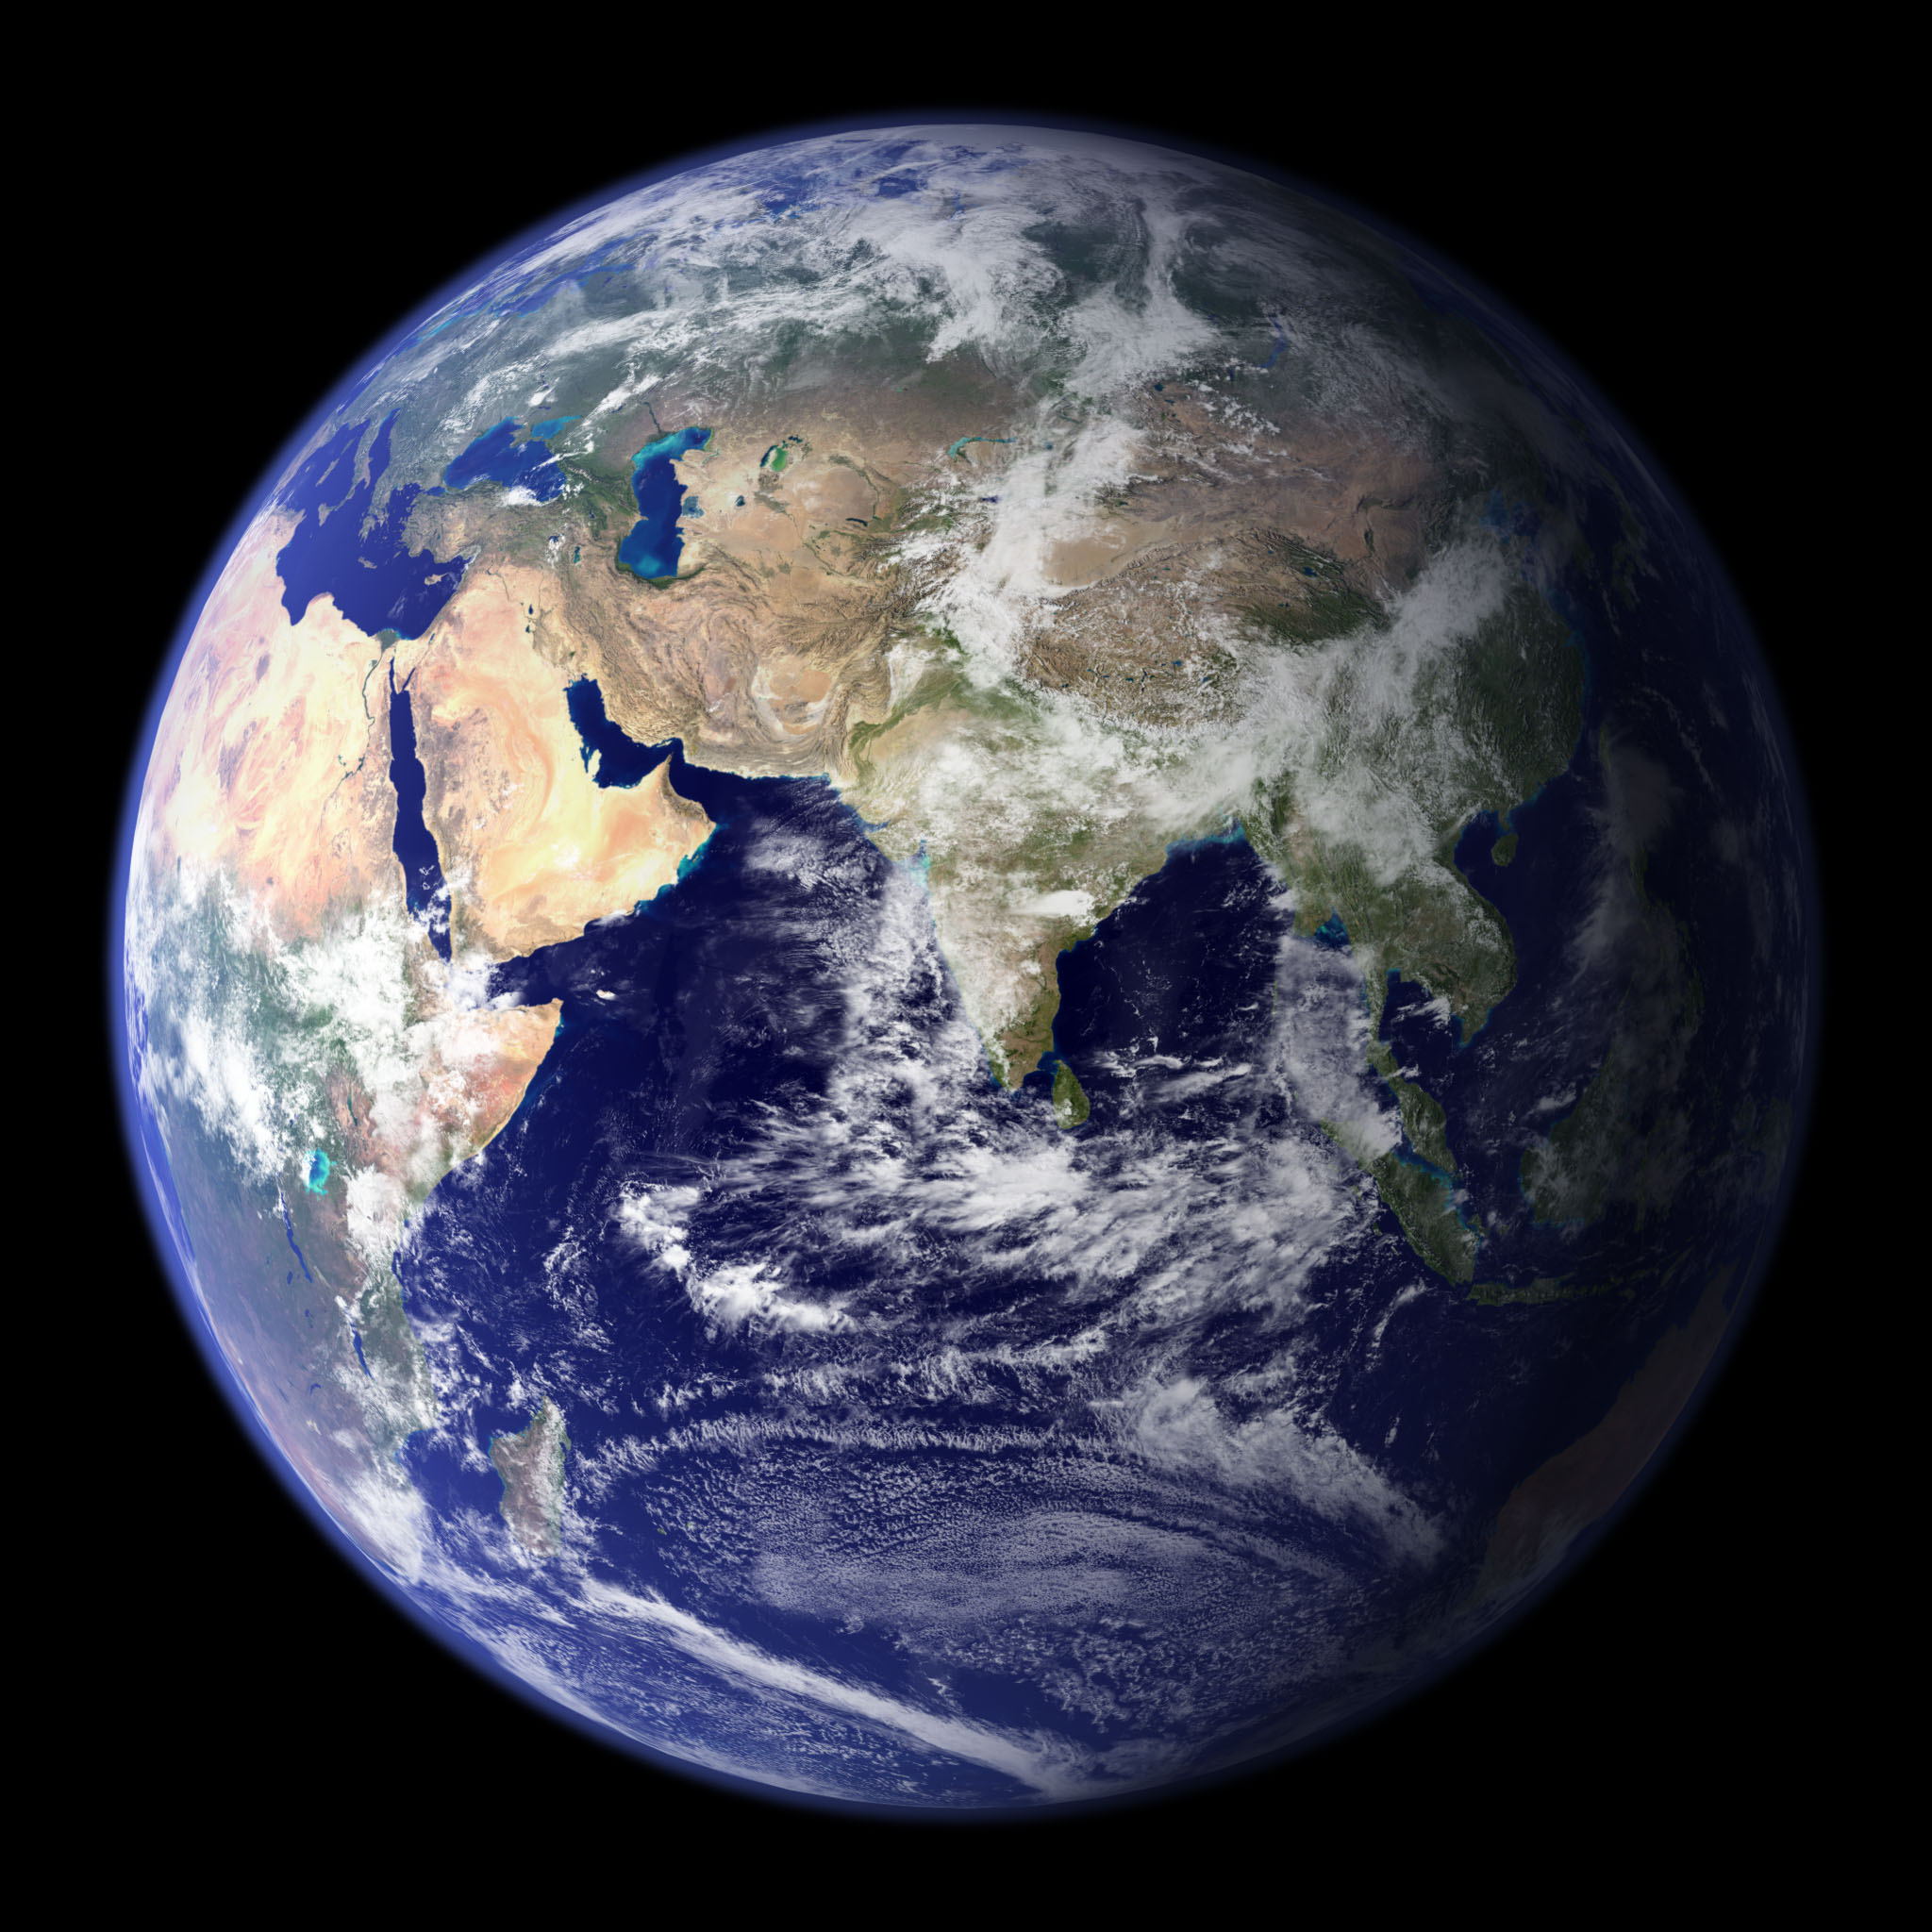 En 2050, la population mondiale sera de 9,8 milliards d'habitants